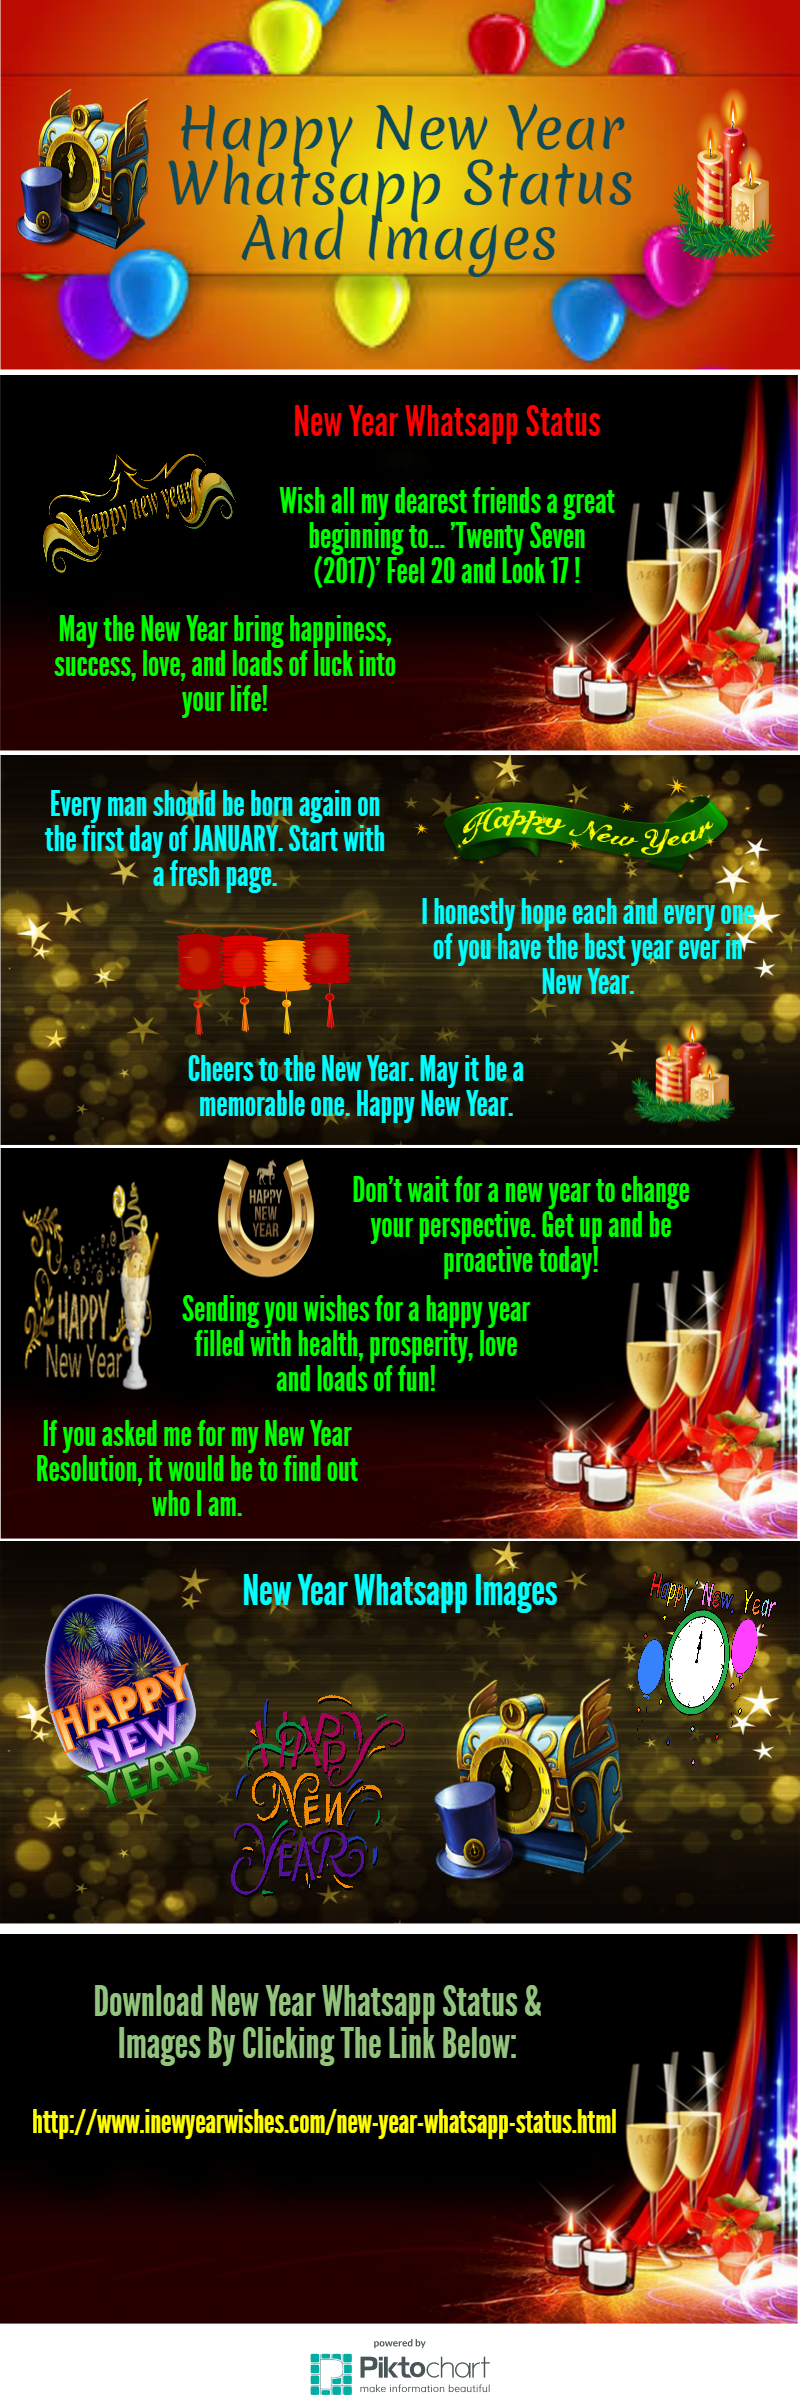 Happy new year whatsapp status happy new year pinterest wish happy new year 2018 on whatsapp to your loverboyfriendgirlfriend by sending a very happy new year whatsapp messages and updates regarding new year kristyandbryce Images